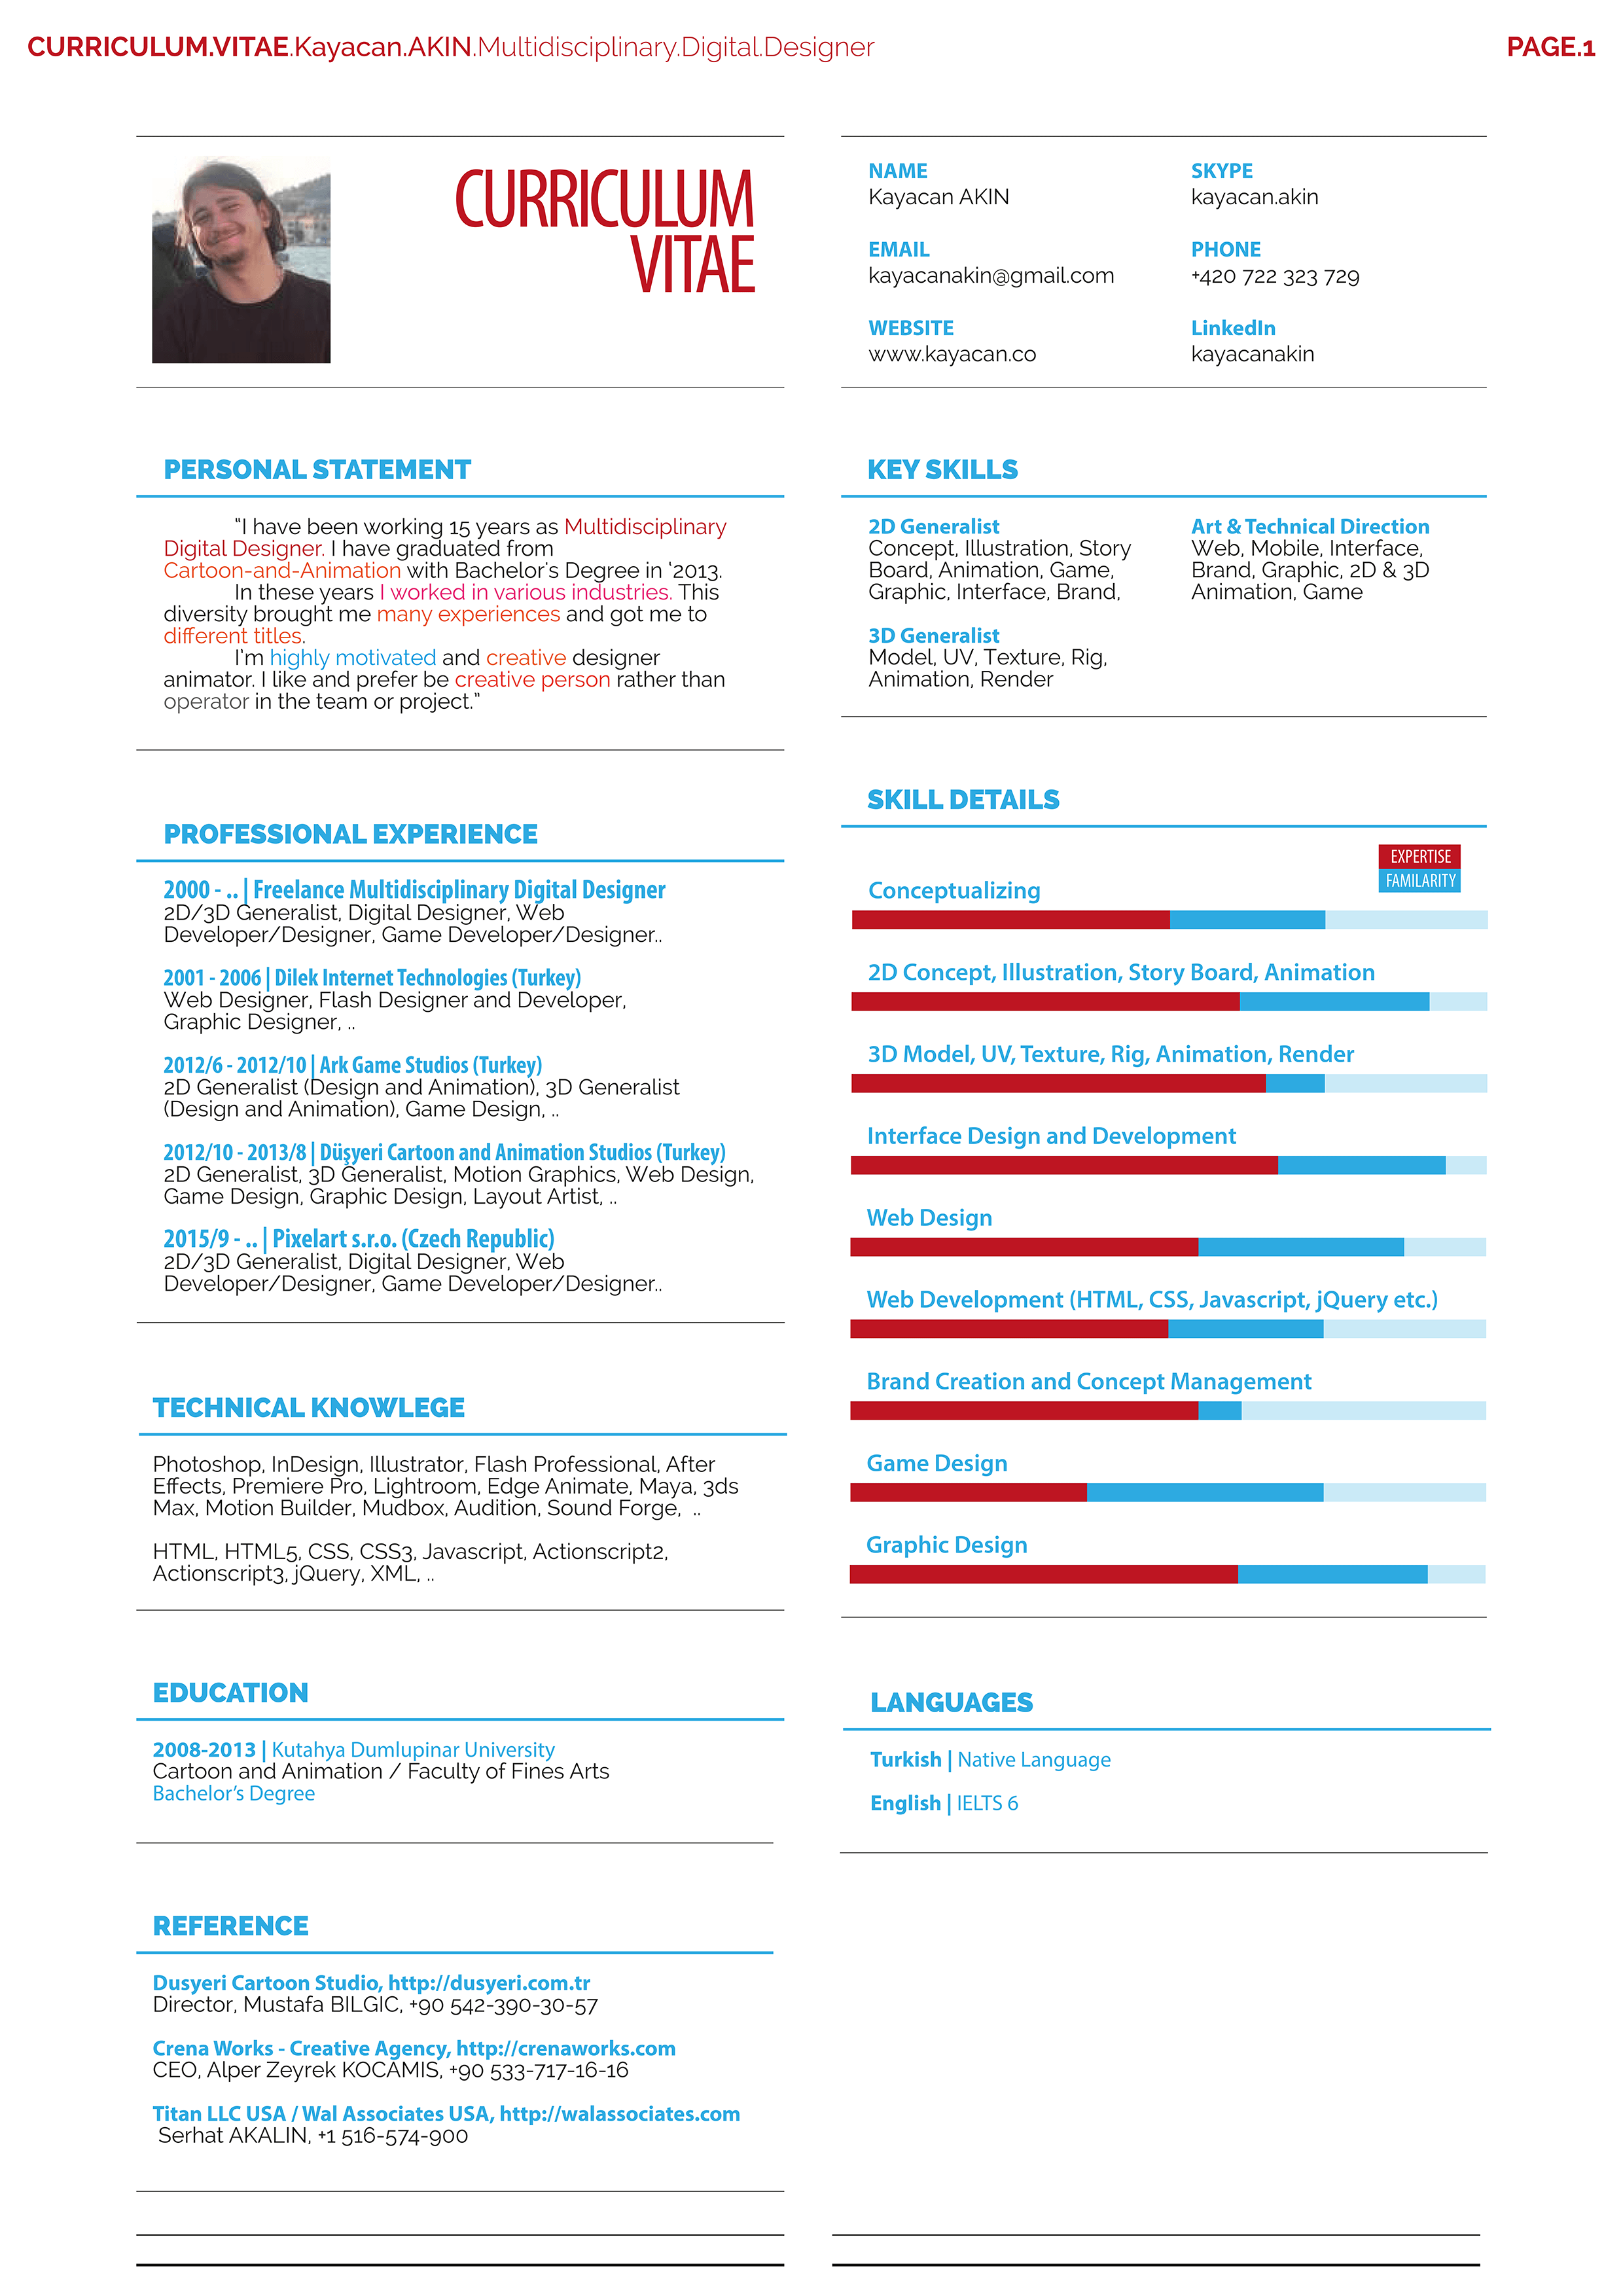 resume curriculum vitae kayacan akin